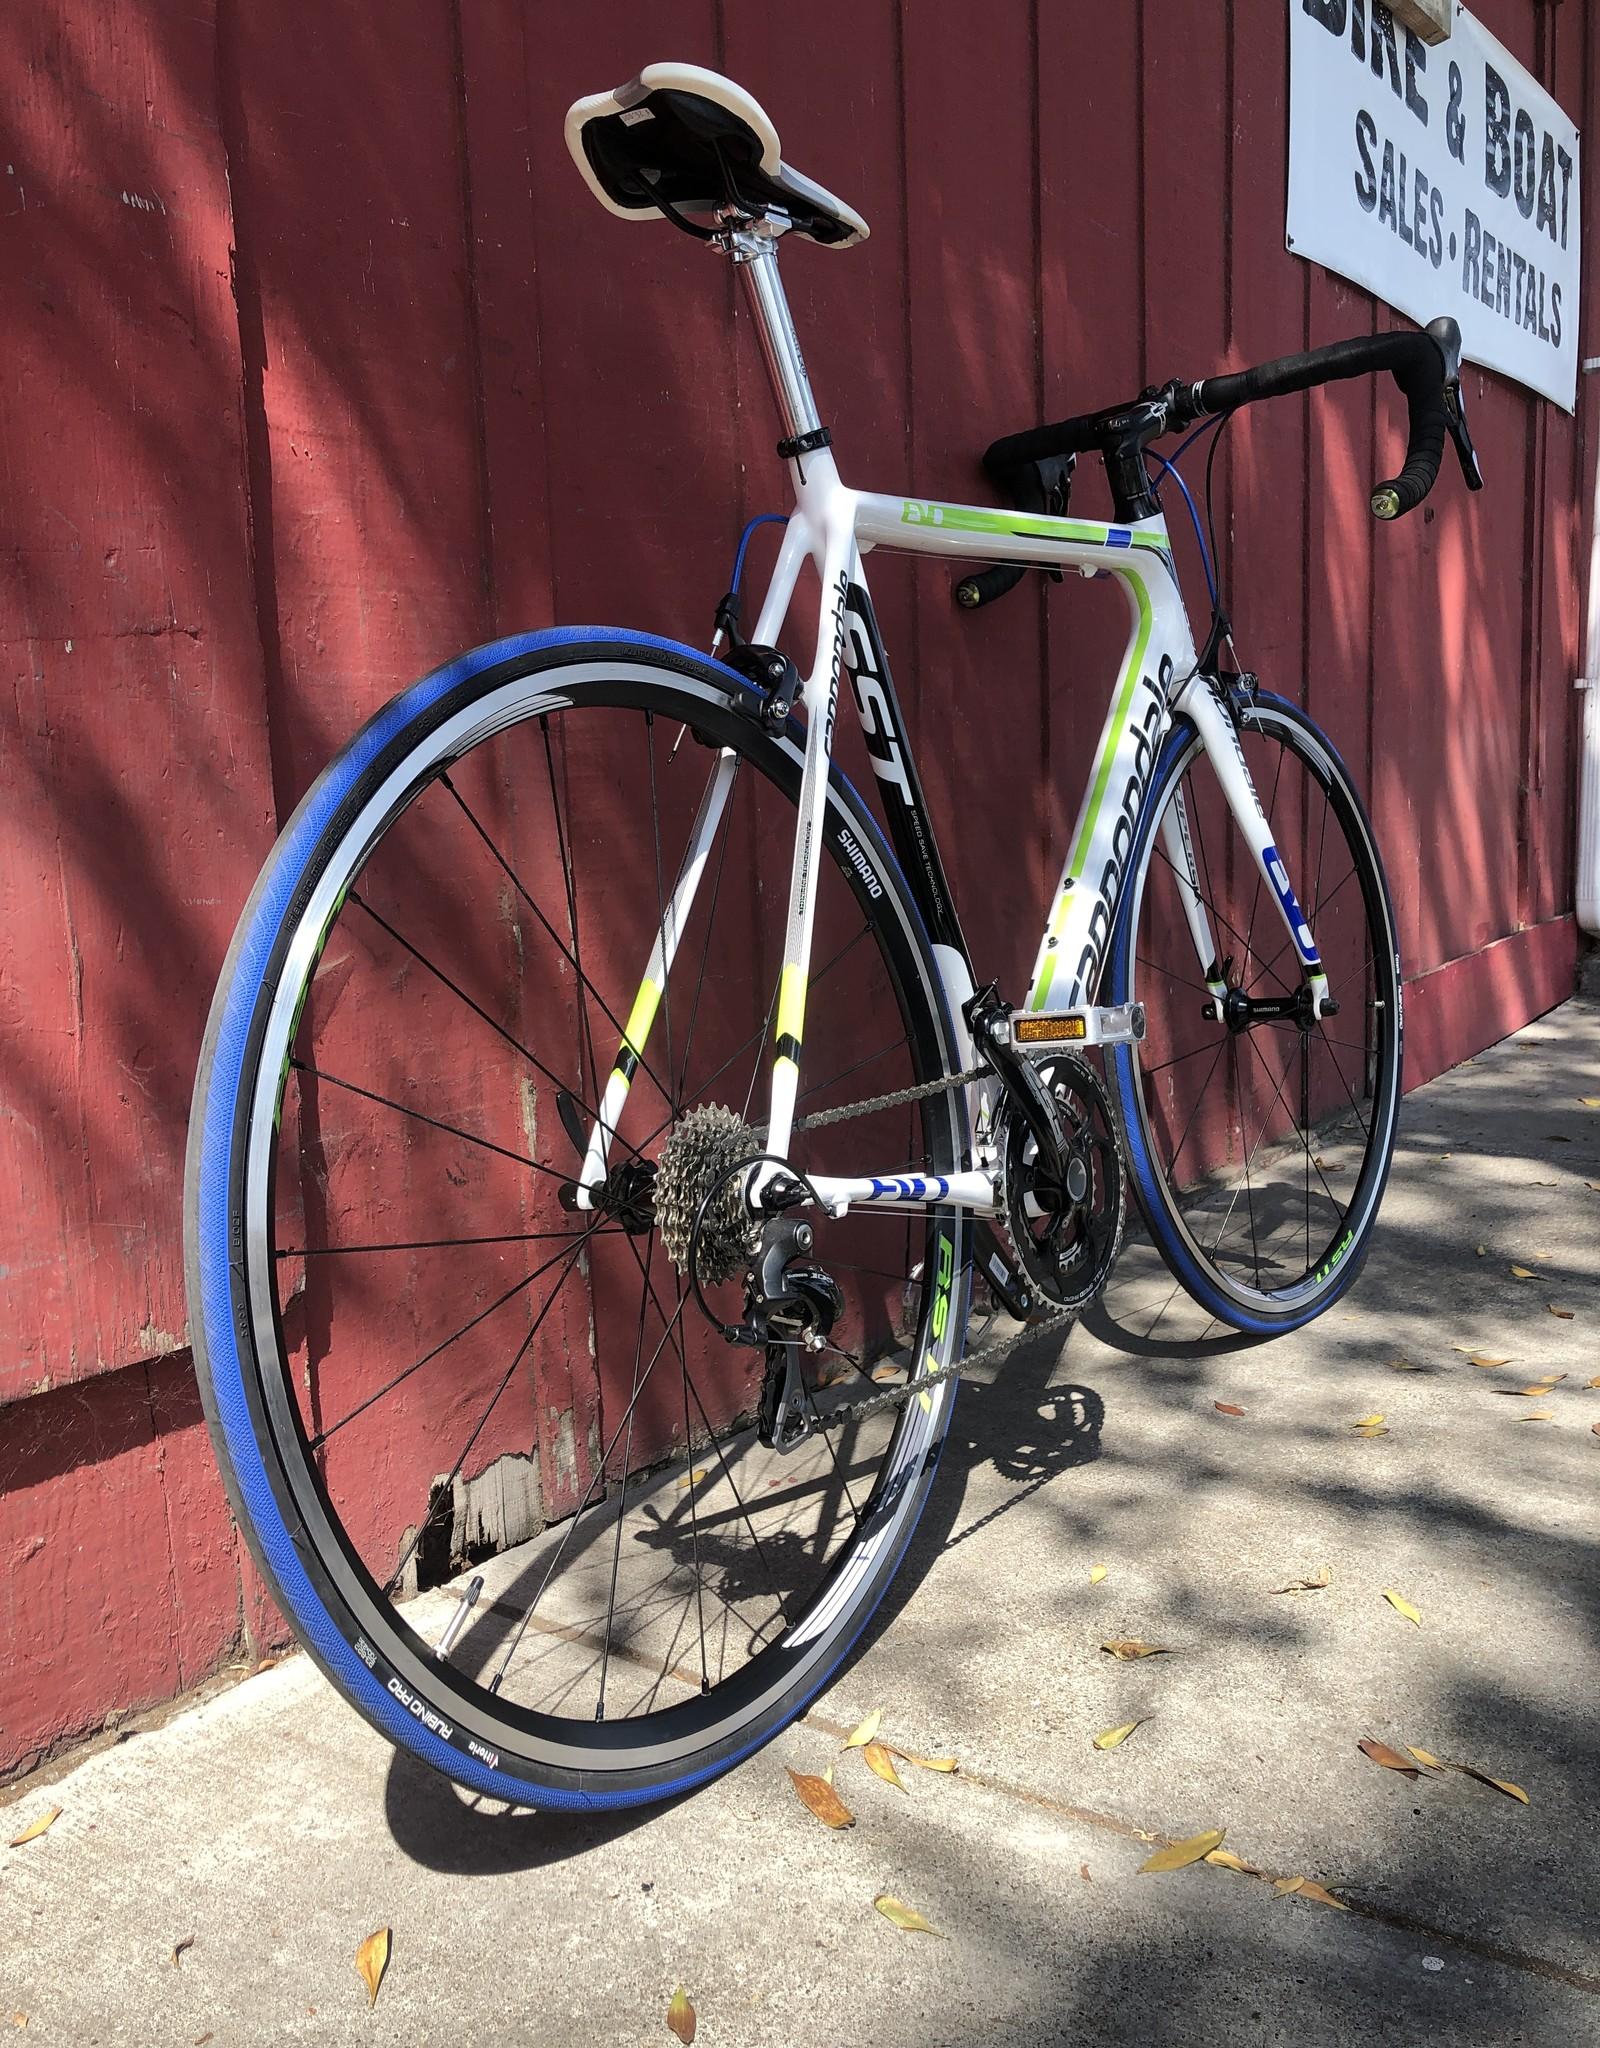 Cannandale Evo -  carbon - 56cm - white/blue/green